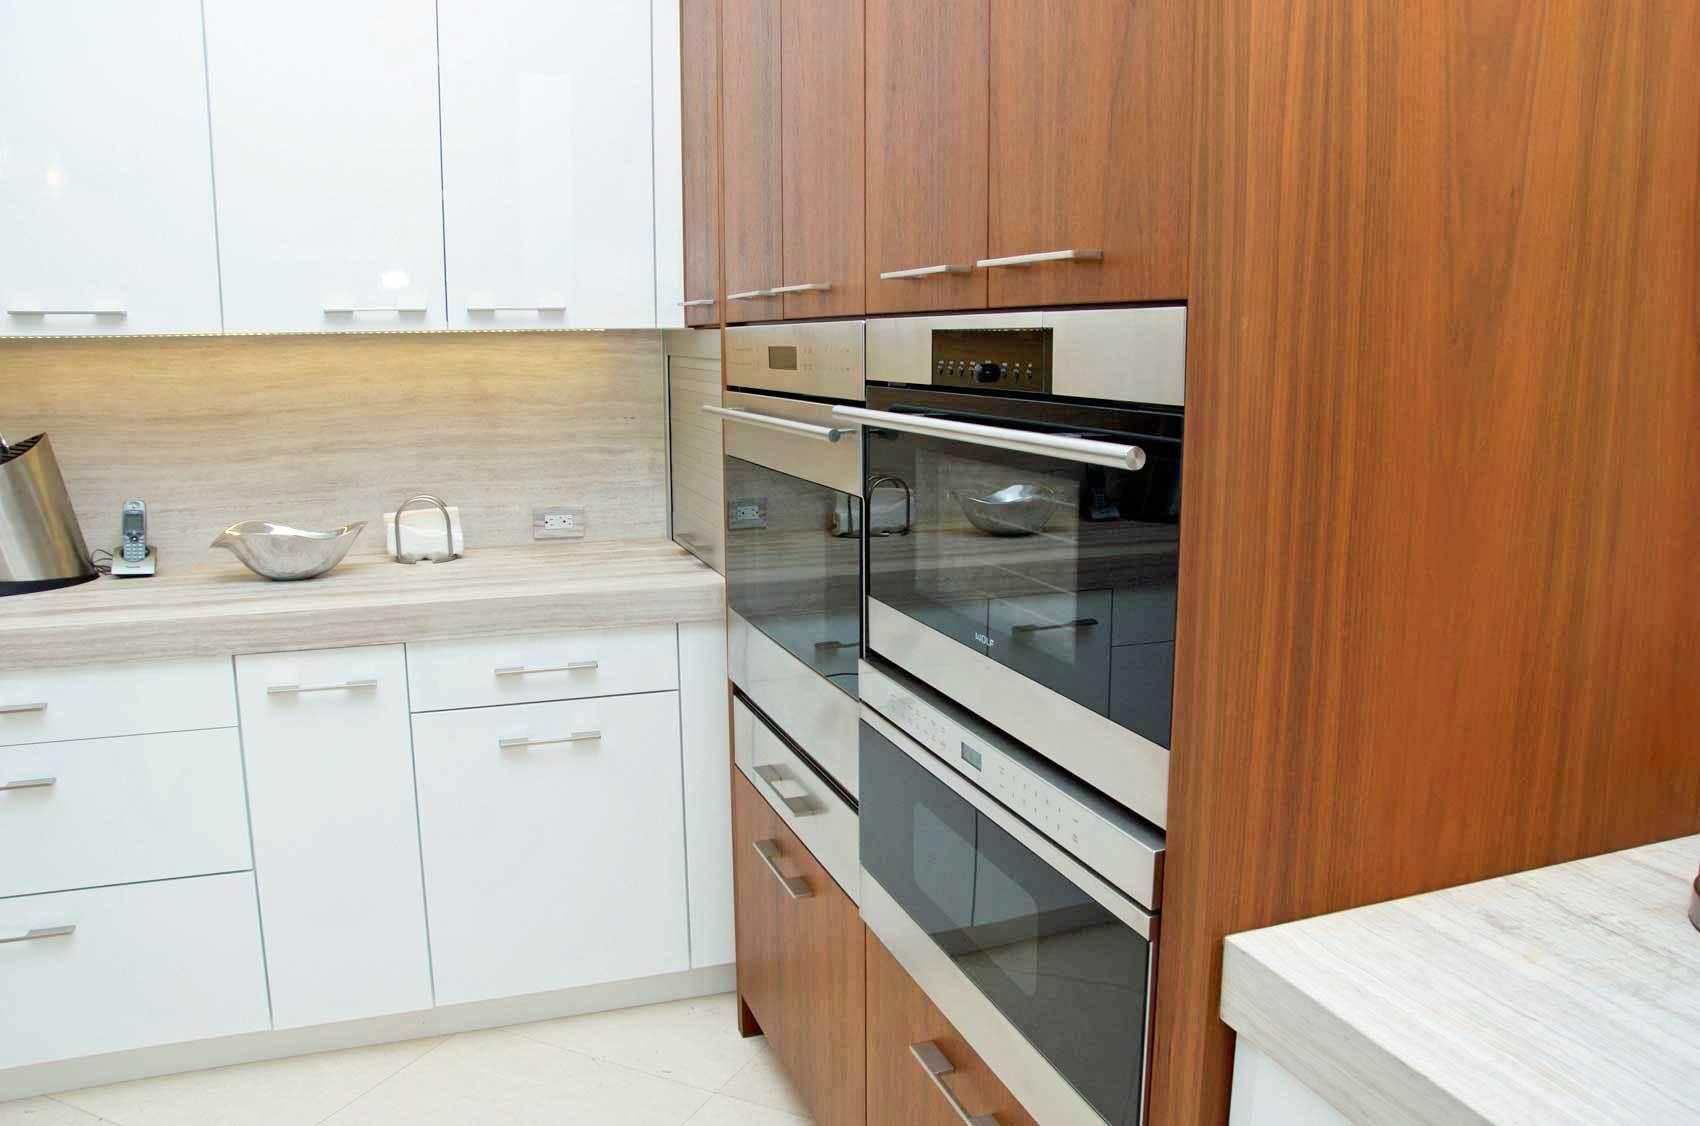 DSC_0849-kitchen-cabinetry